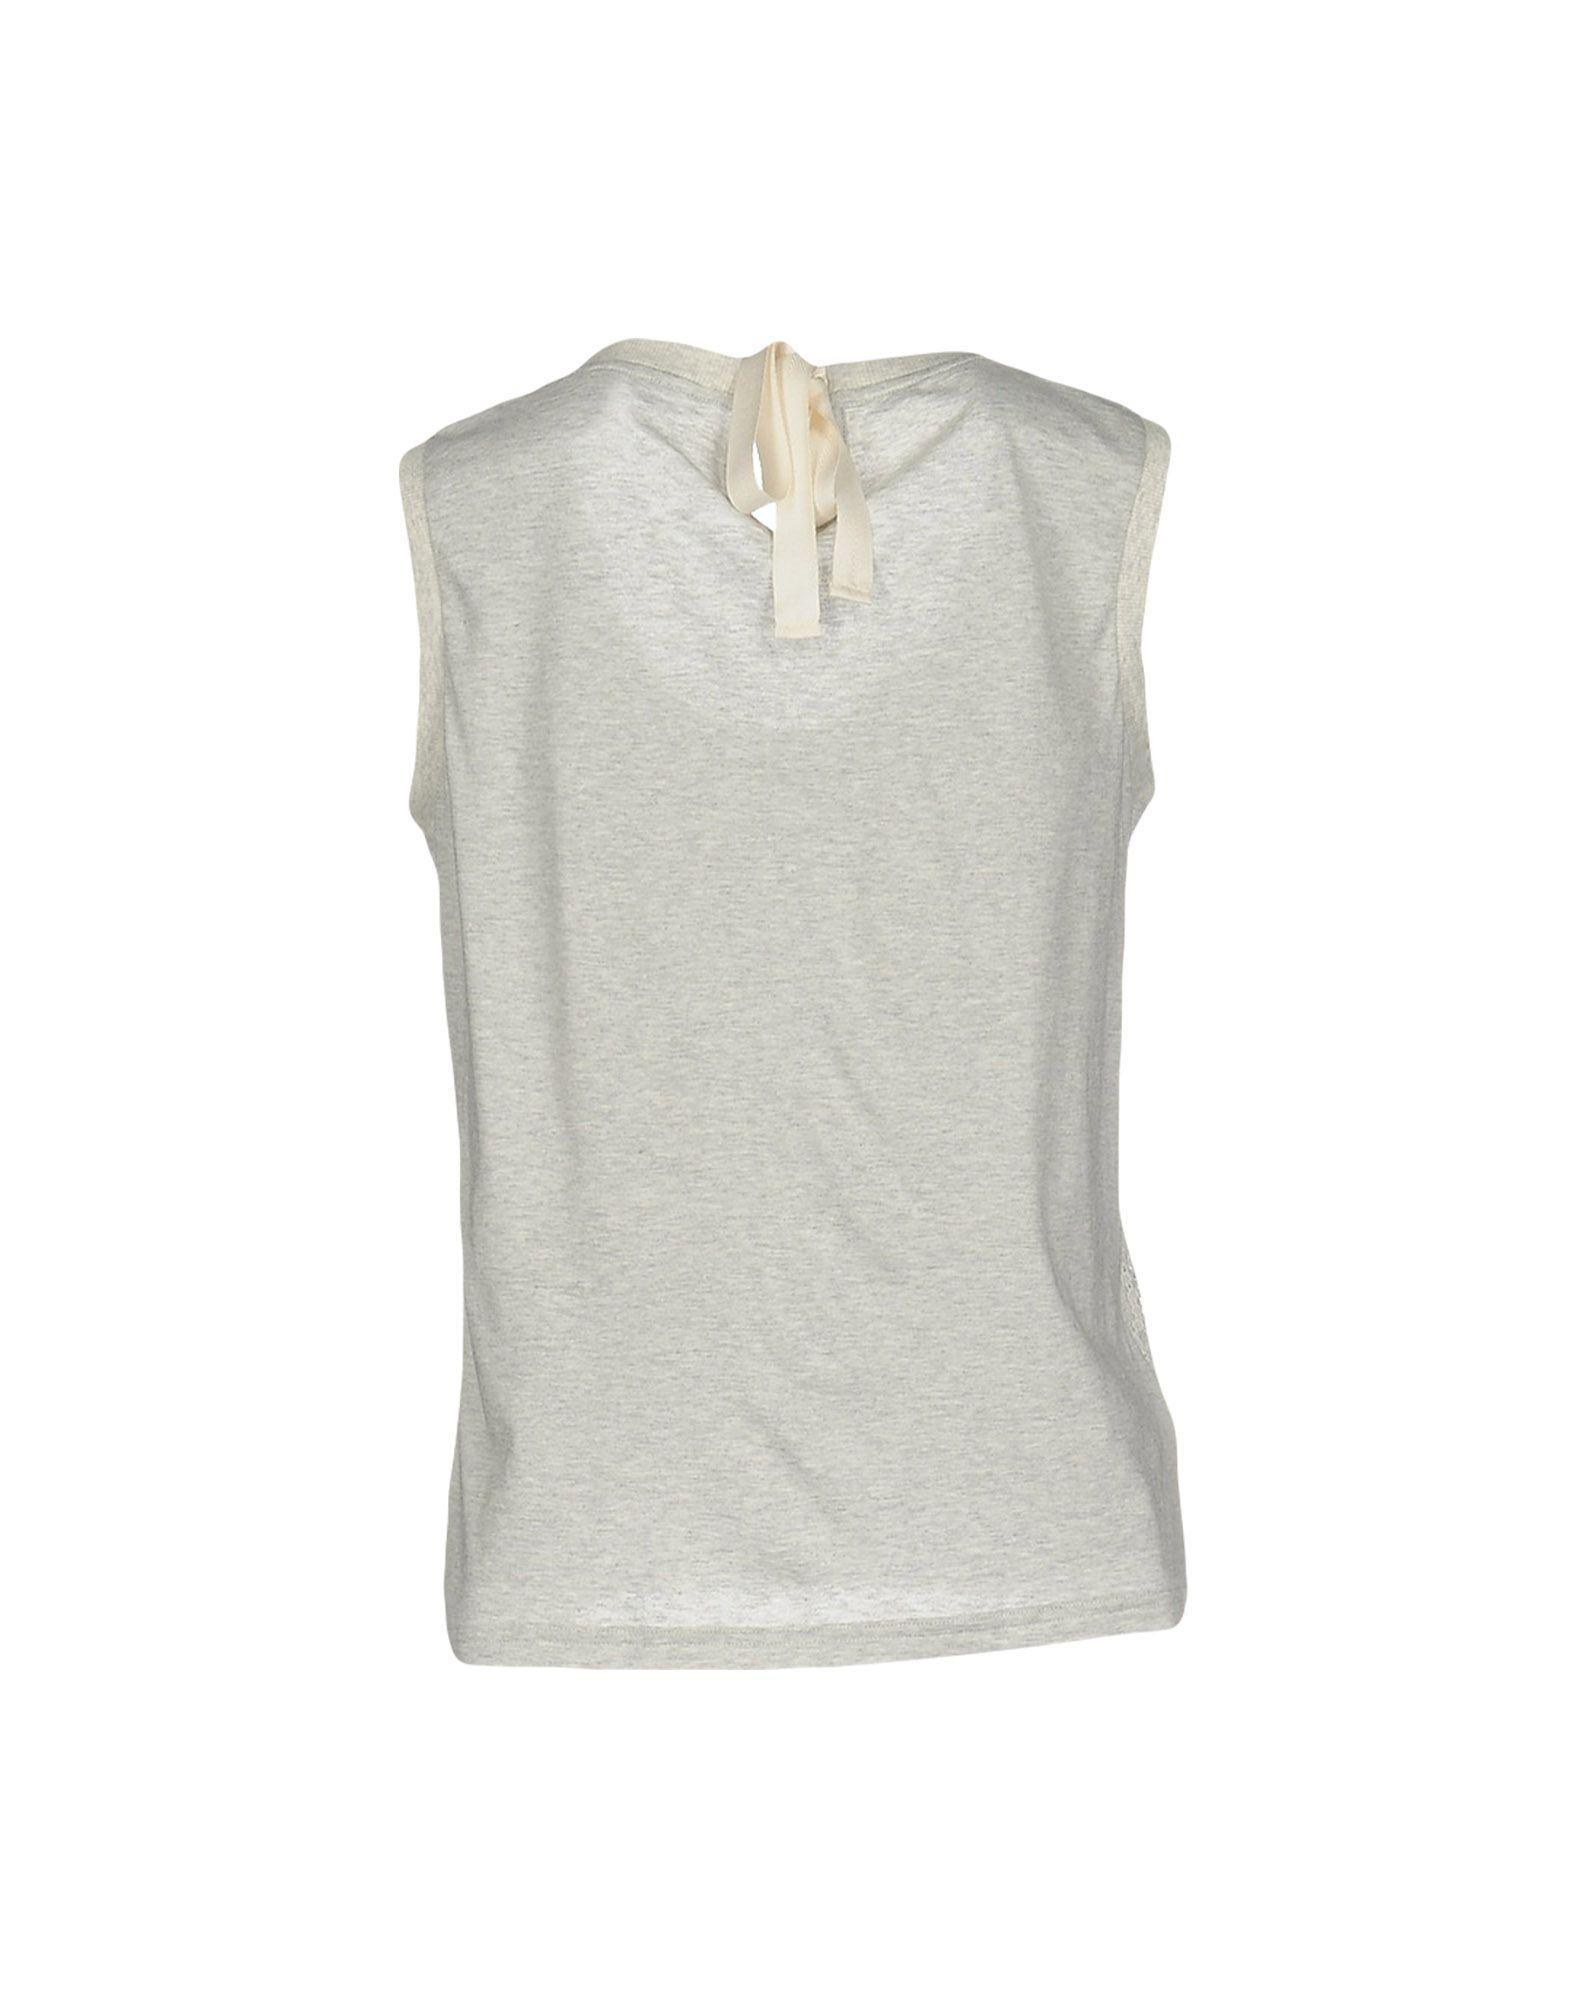 Miu miu t shirt in gray lyst for Miu miu t shirt